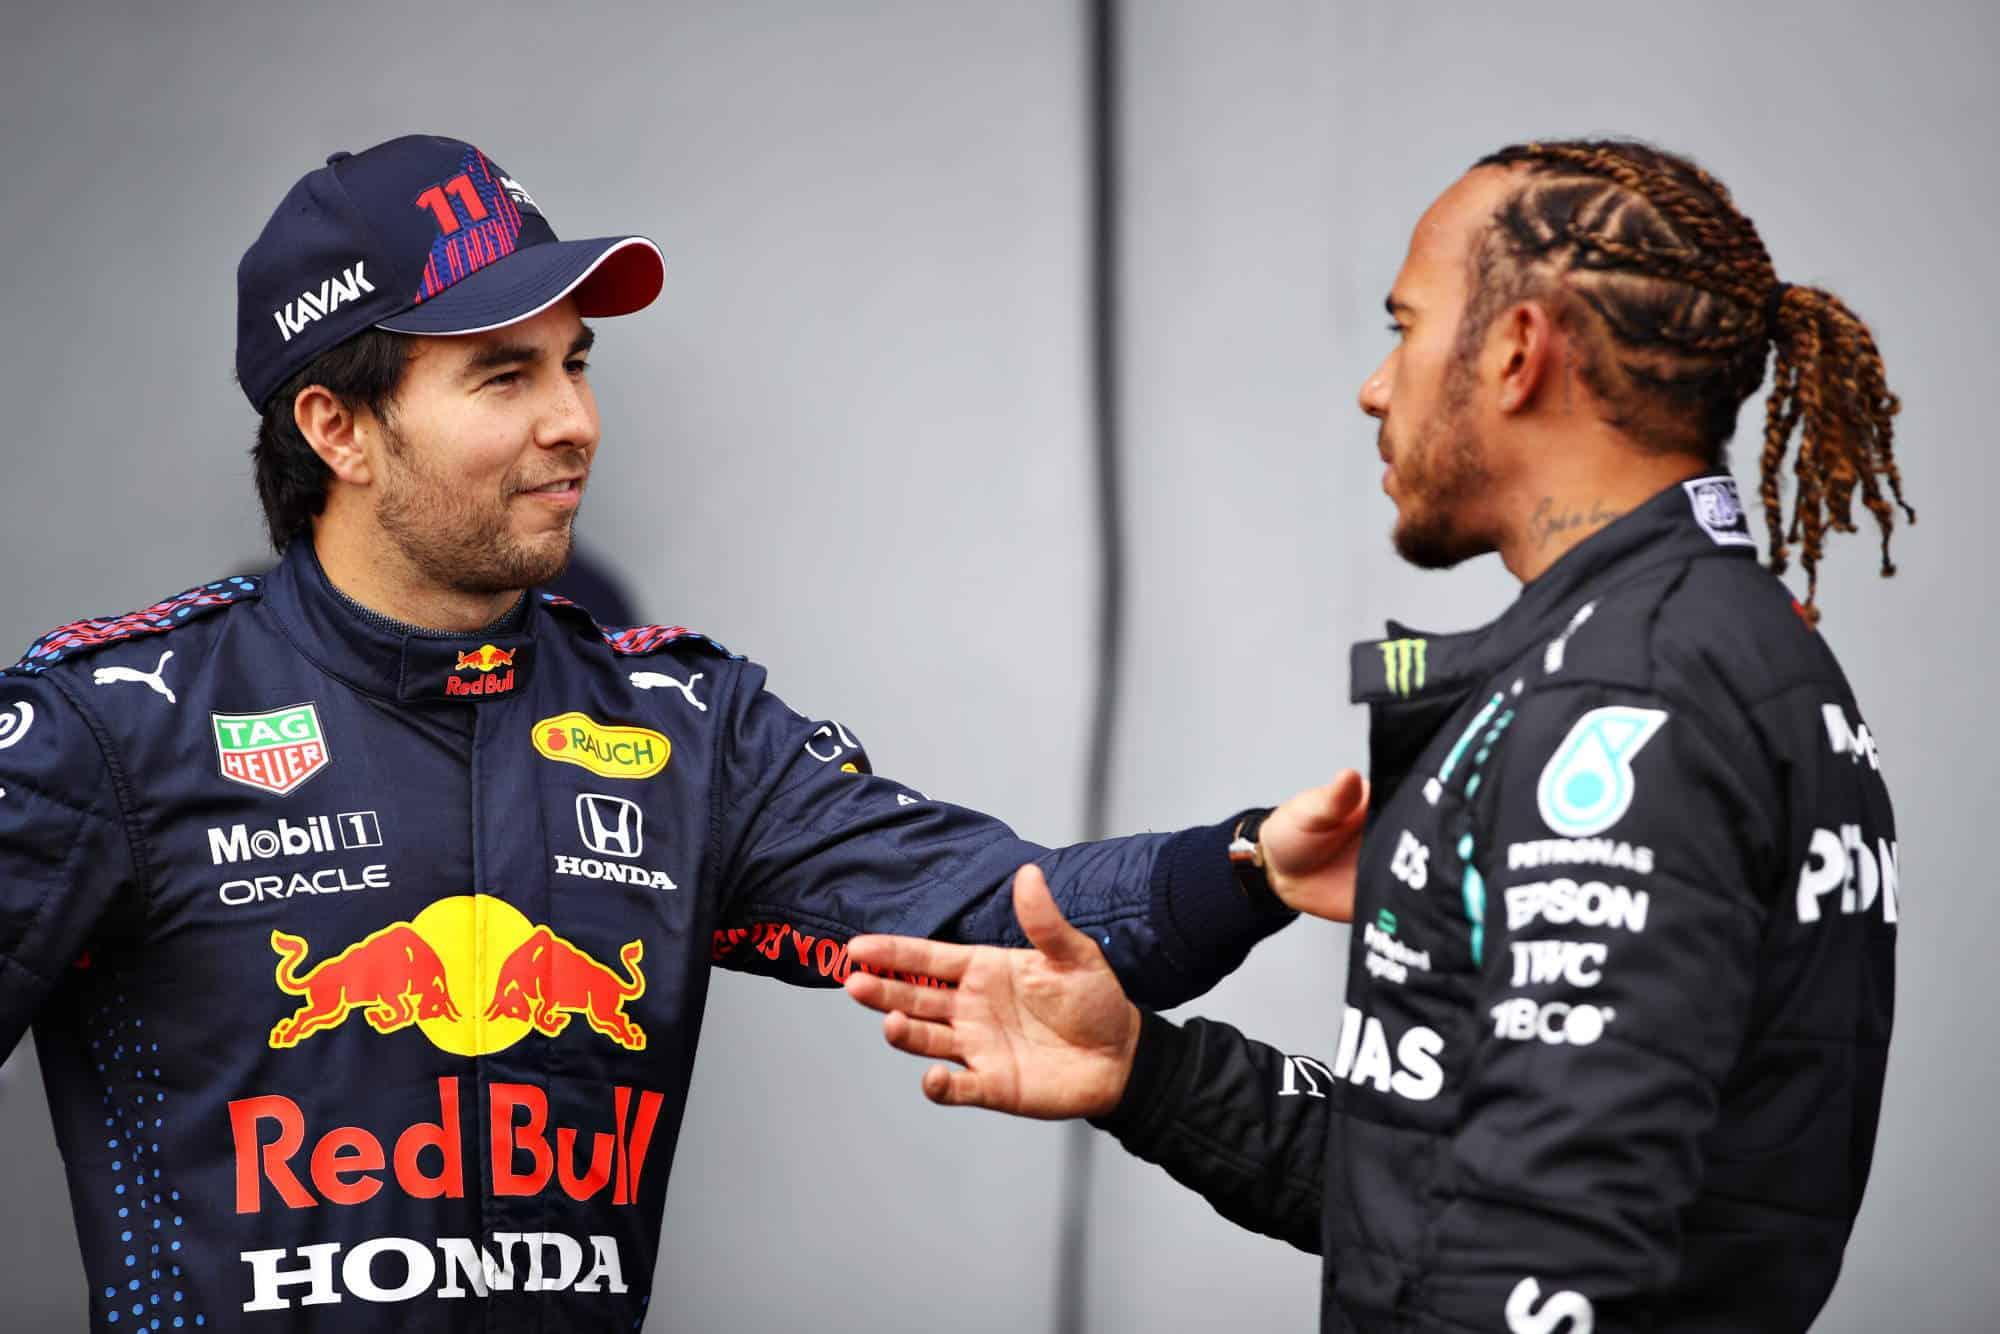 2021 Emilia Romagna GP Perez and Hamilton after qualifying Photo Red Bull